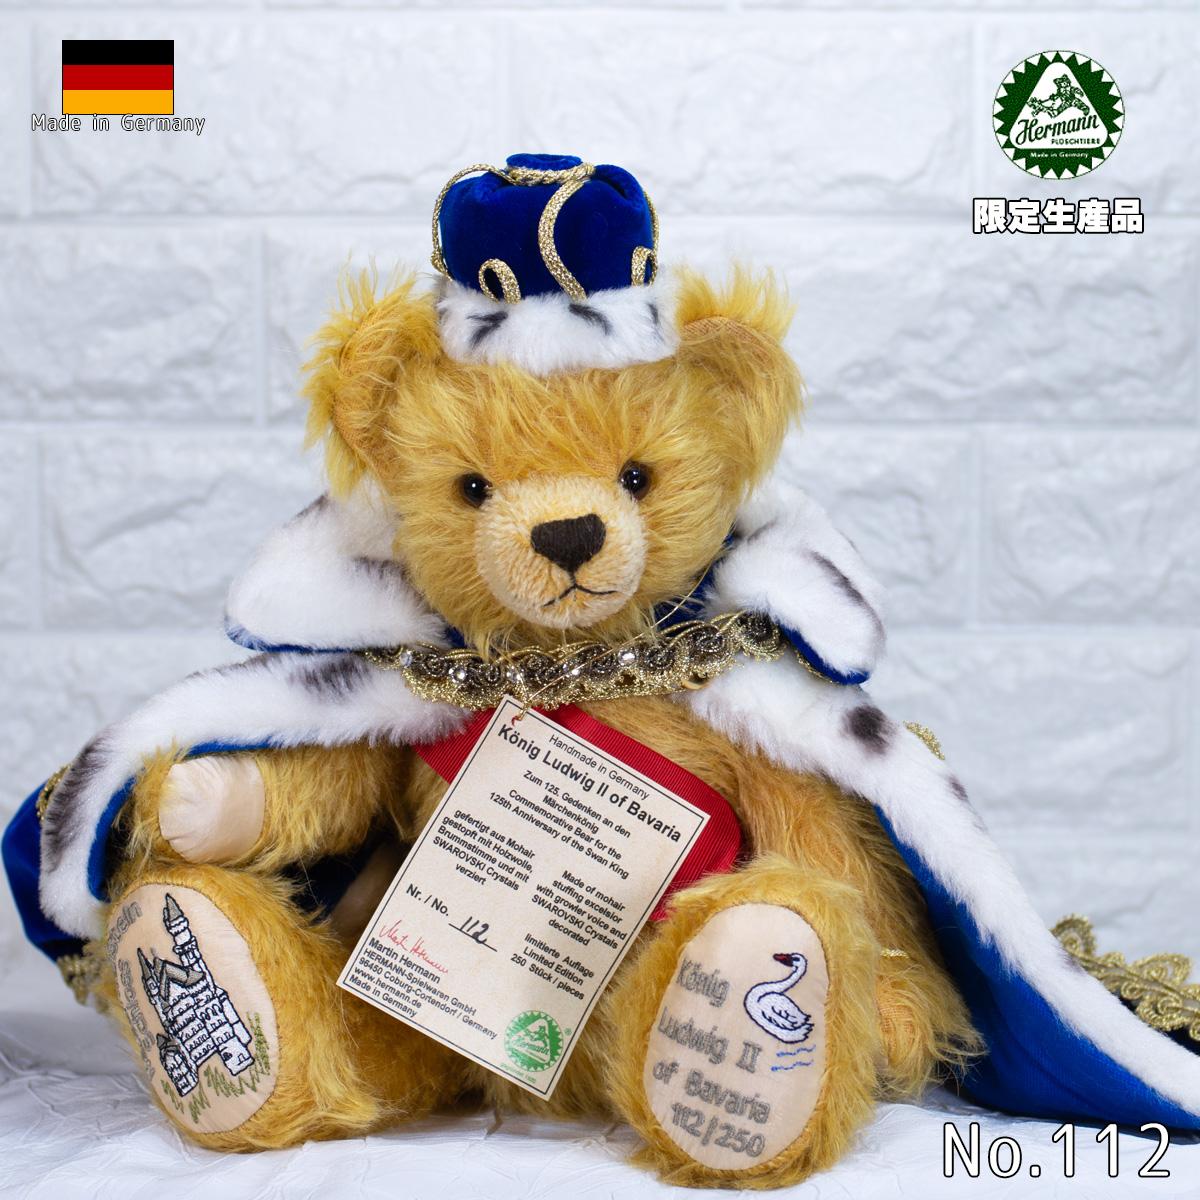 Hermann Coburg社のテディベア キングルートヴィヒ2世 (バイエルン王) king Ludwig II 2011■グリーンハーマン社 限定テディベア